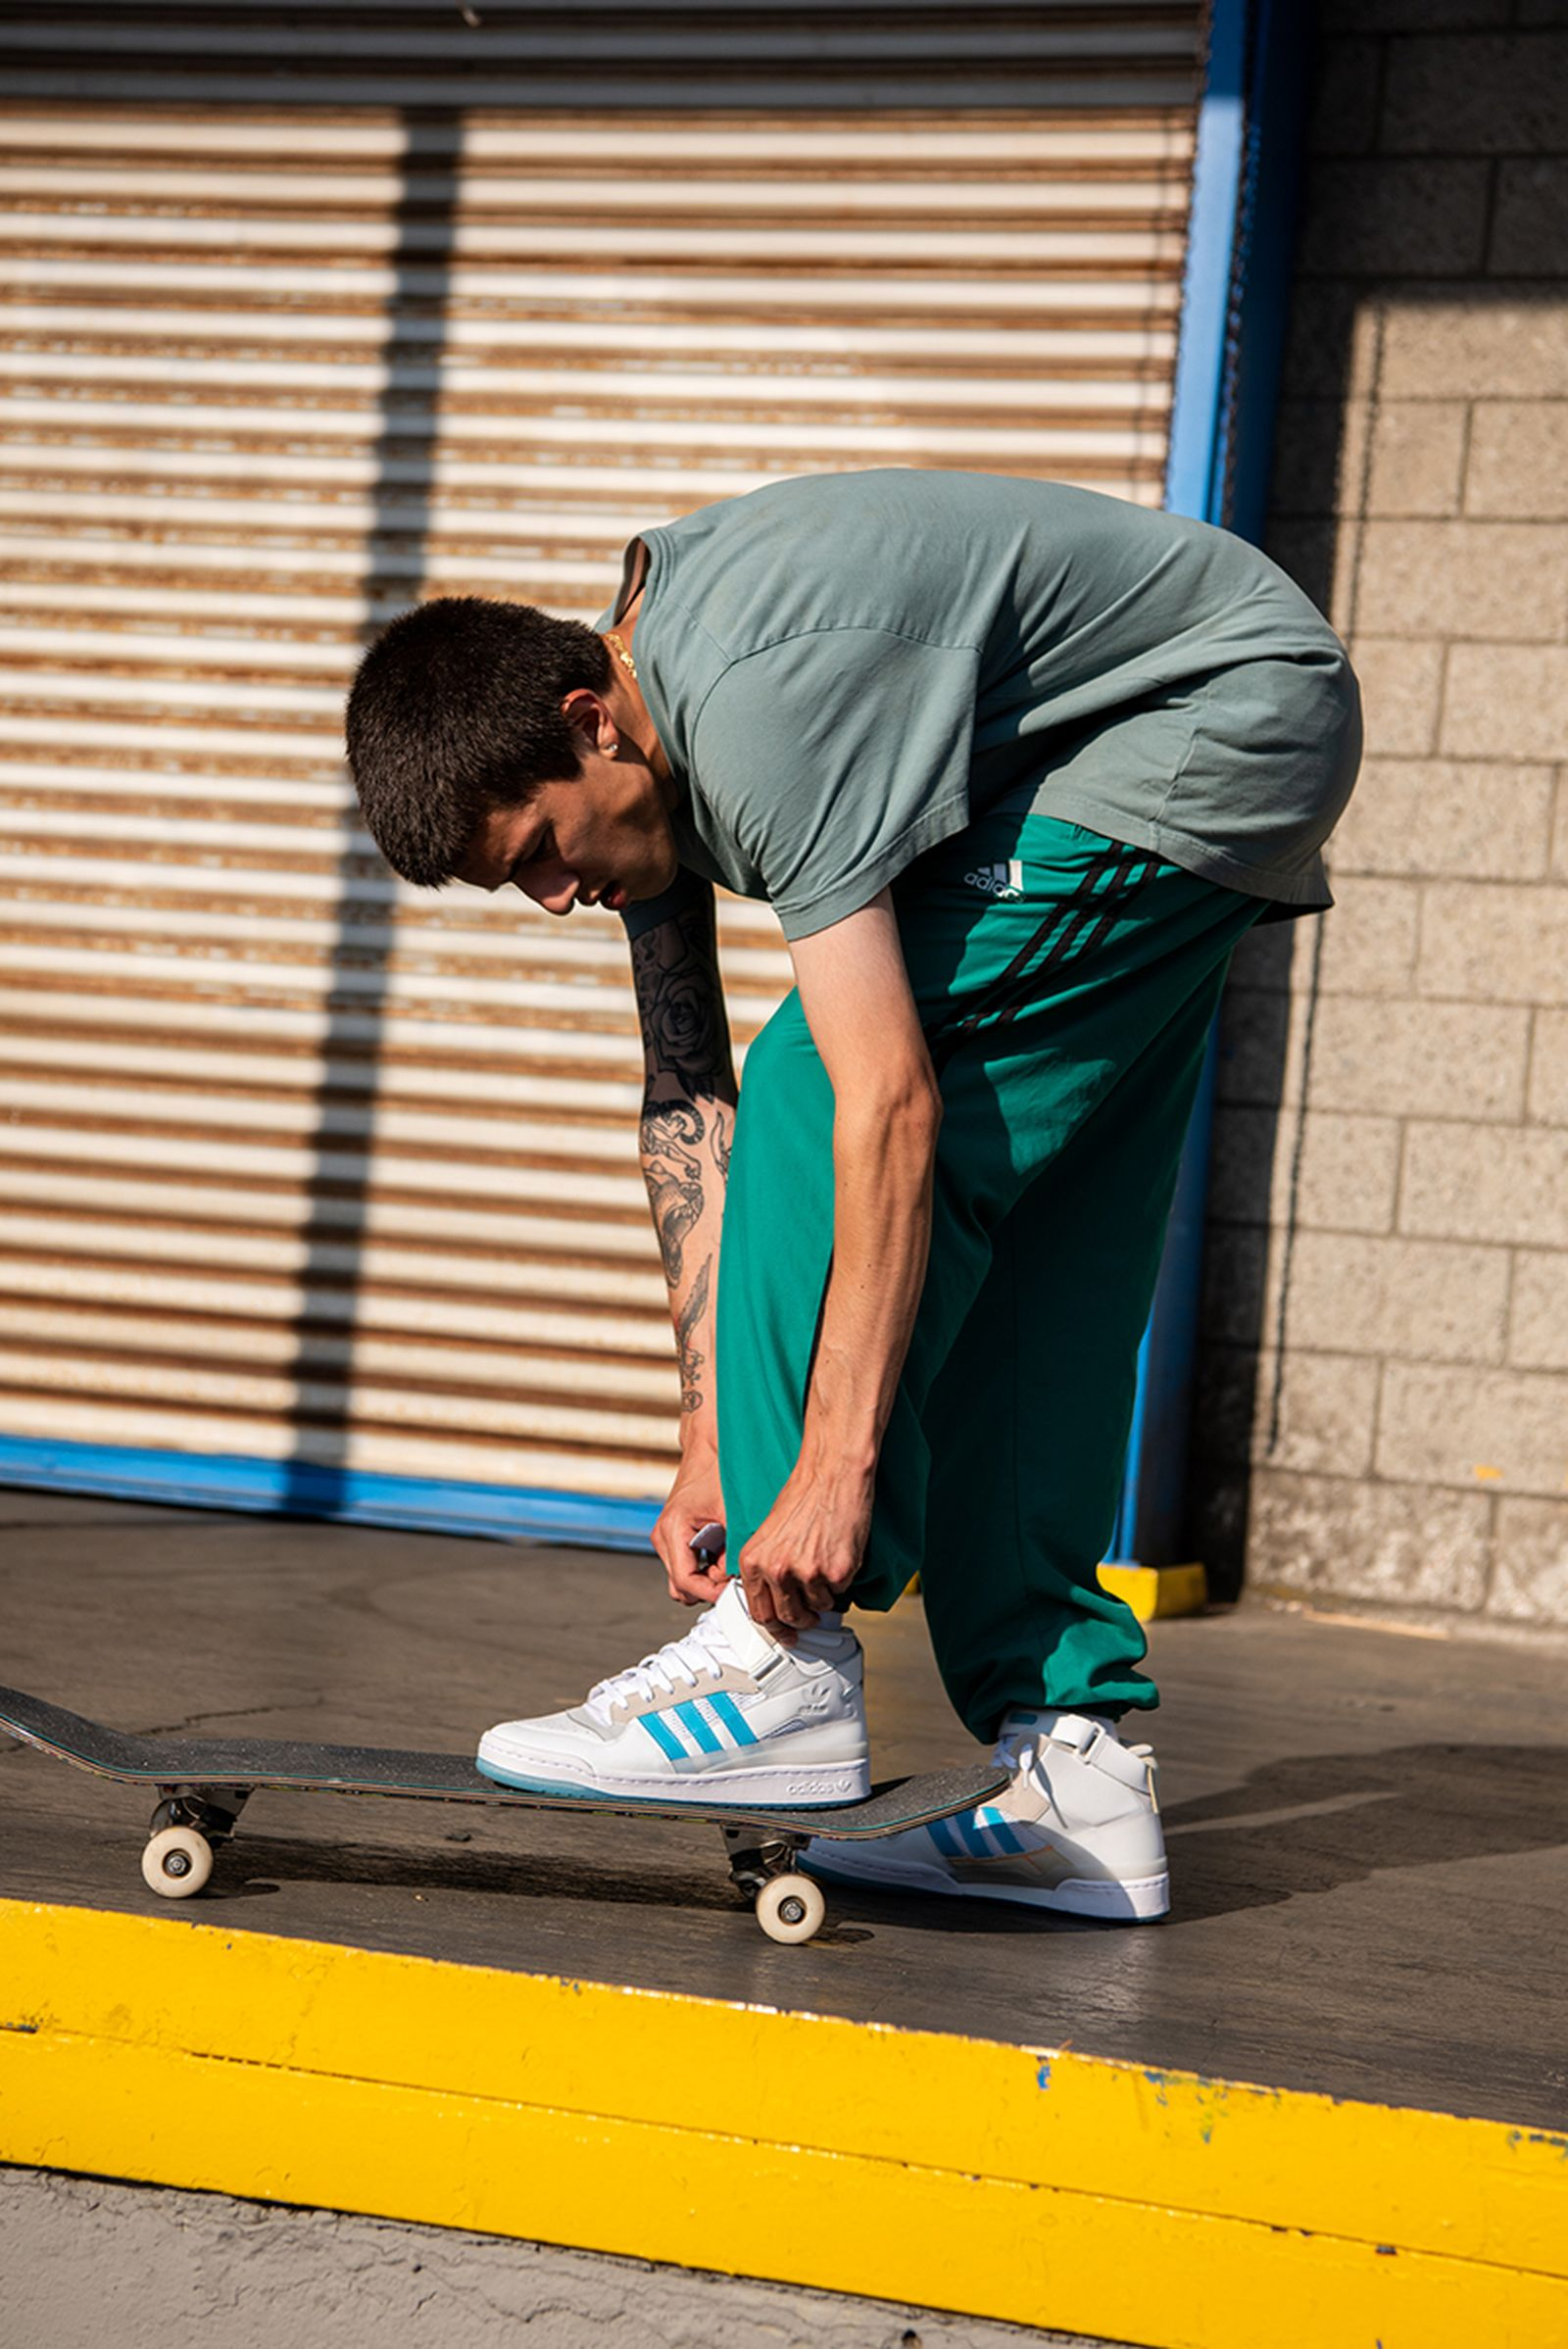 adidas-skateboarding-forum-84-adv-diego-najera-release-date-price-05